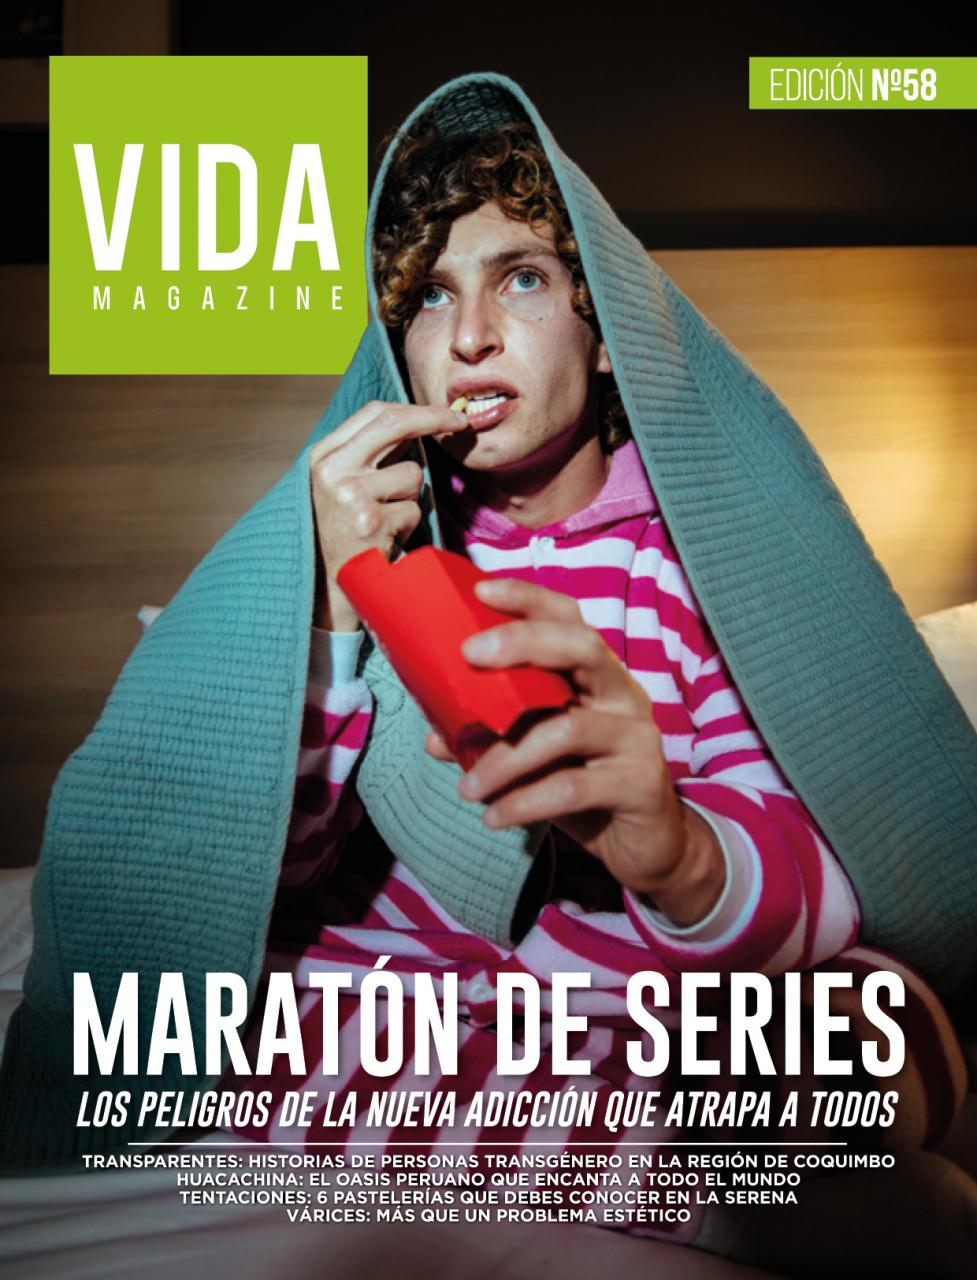 vida-magazine-edicion-n-58